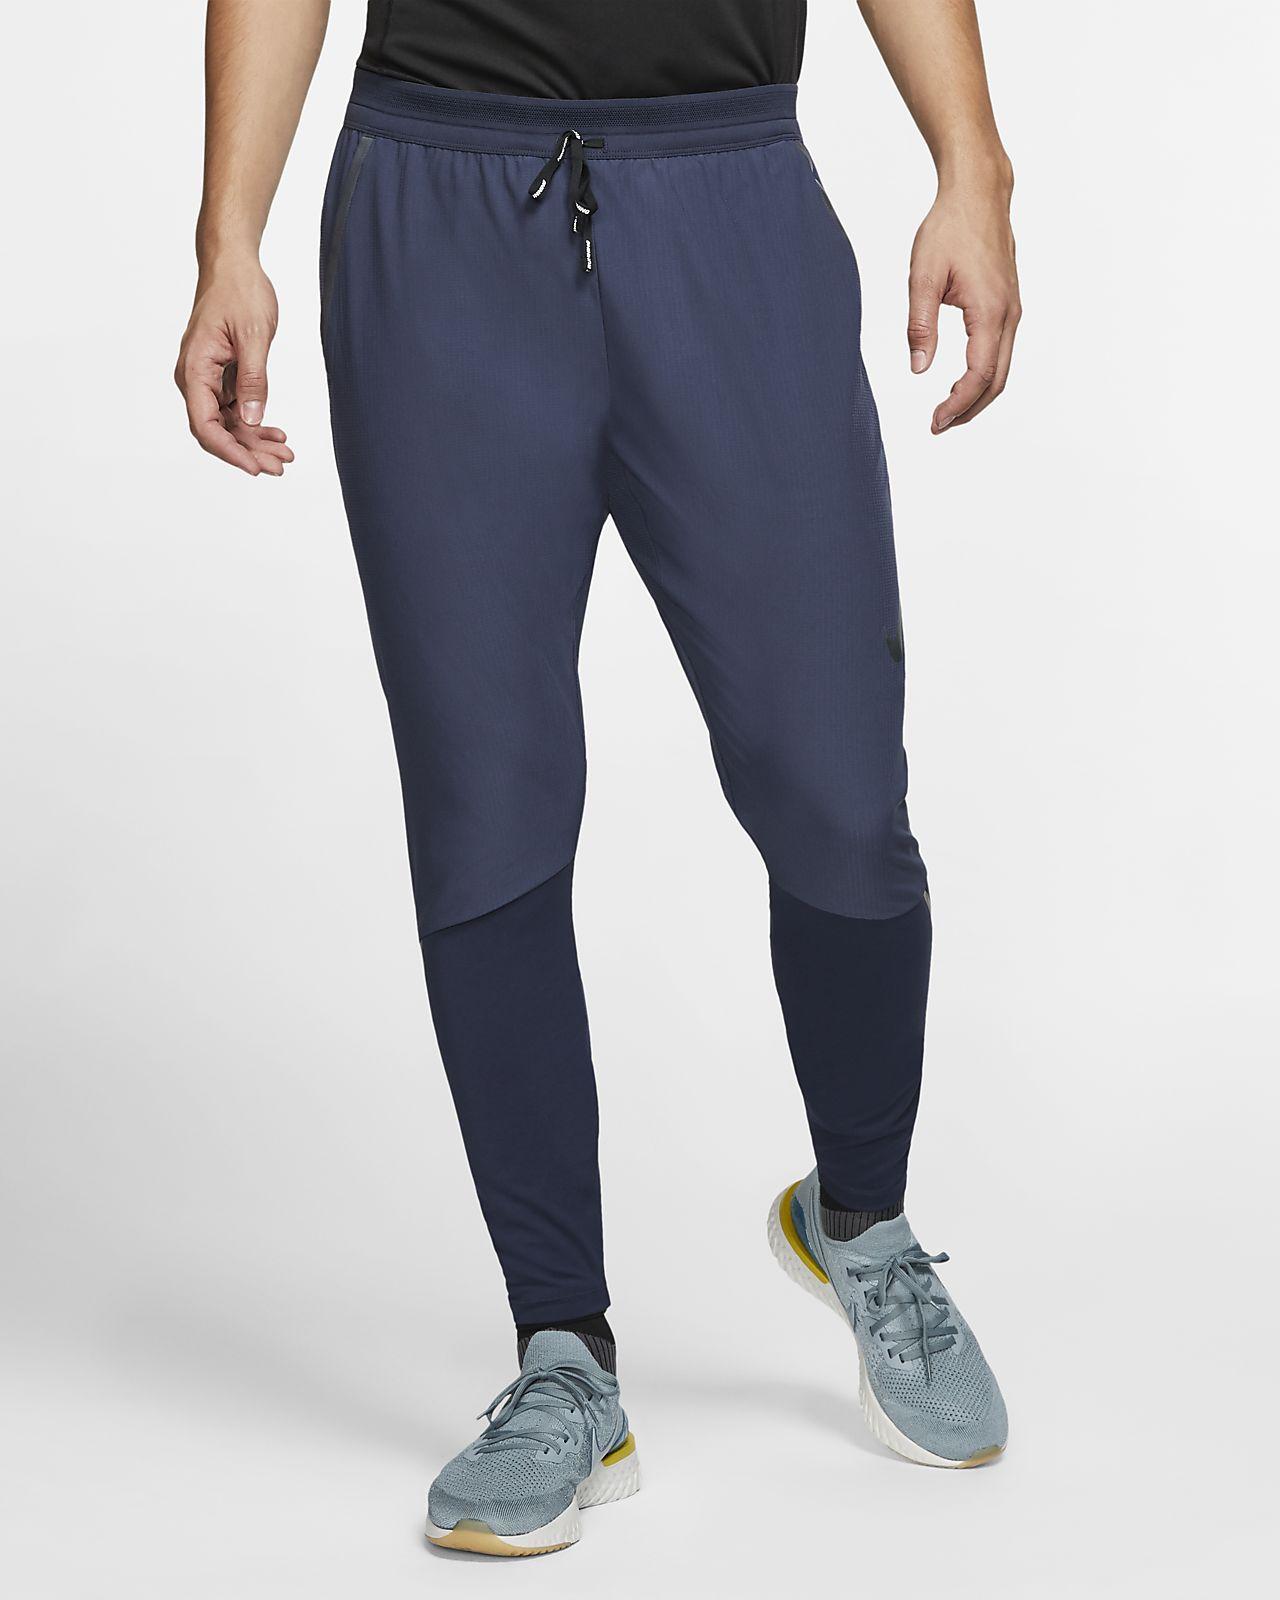 Nike Swift Pantalón de running - Hombre